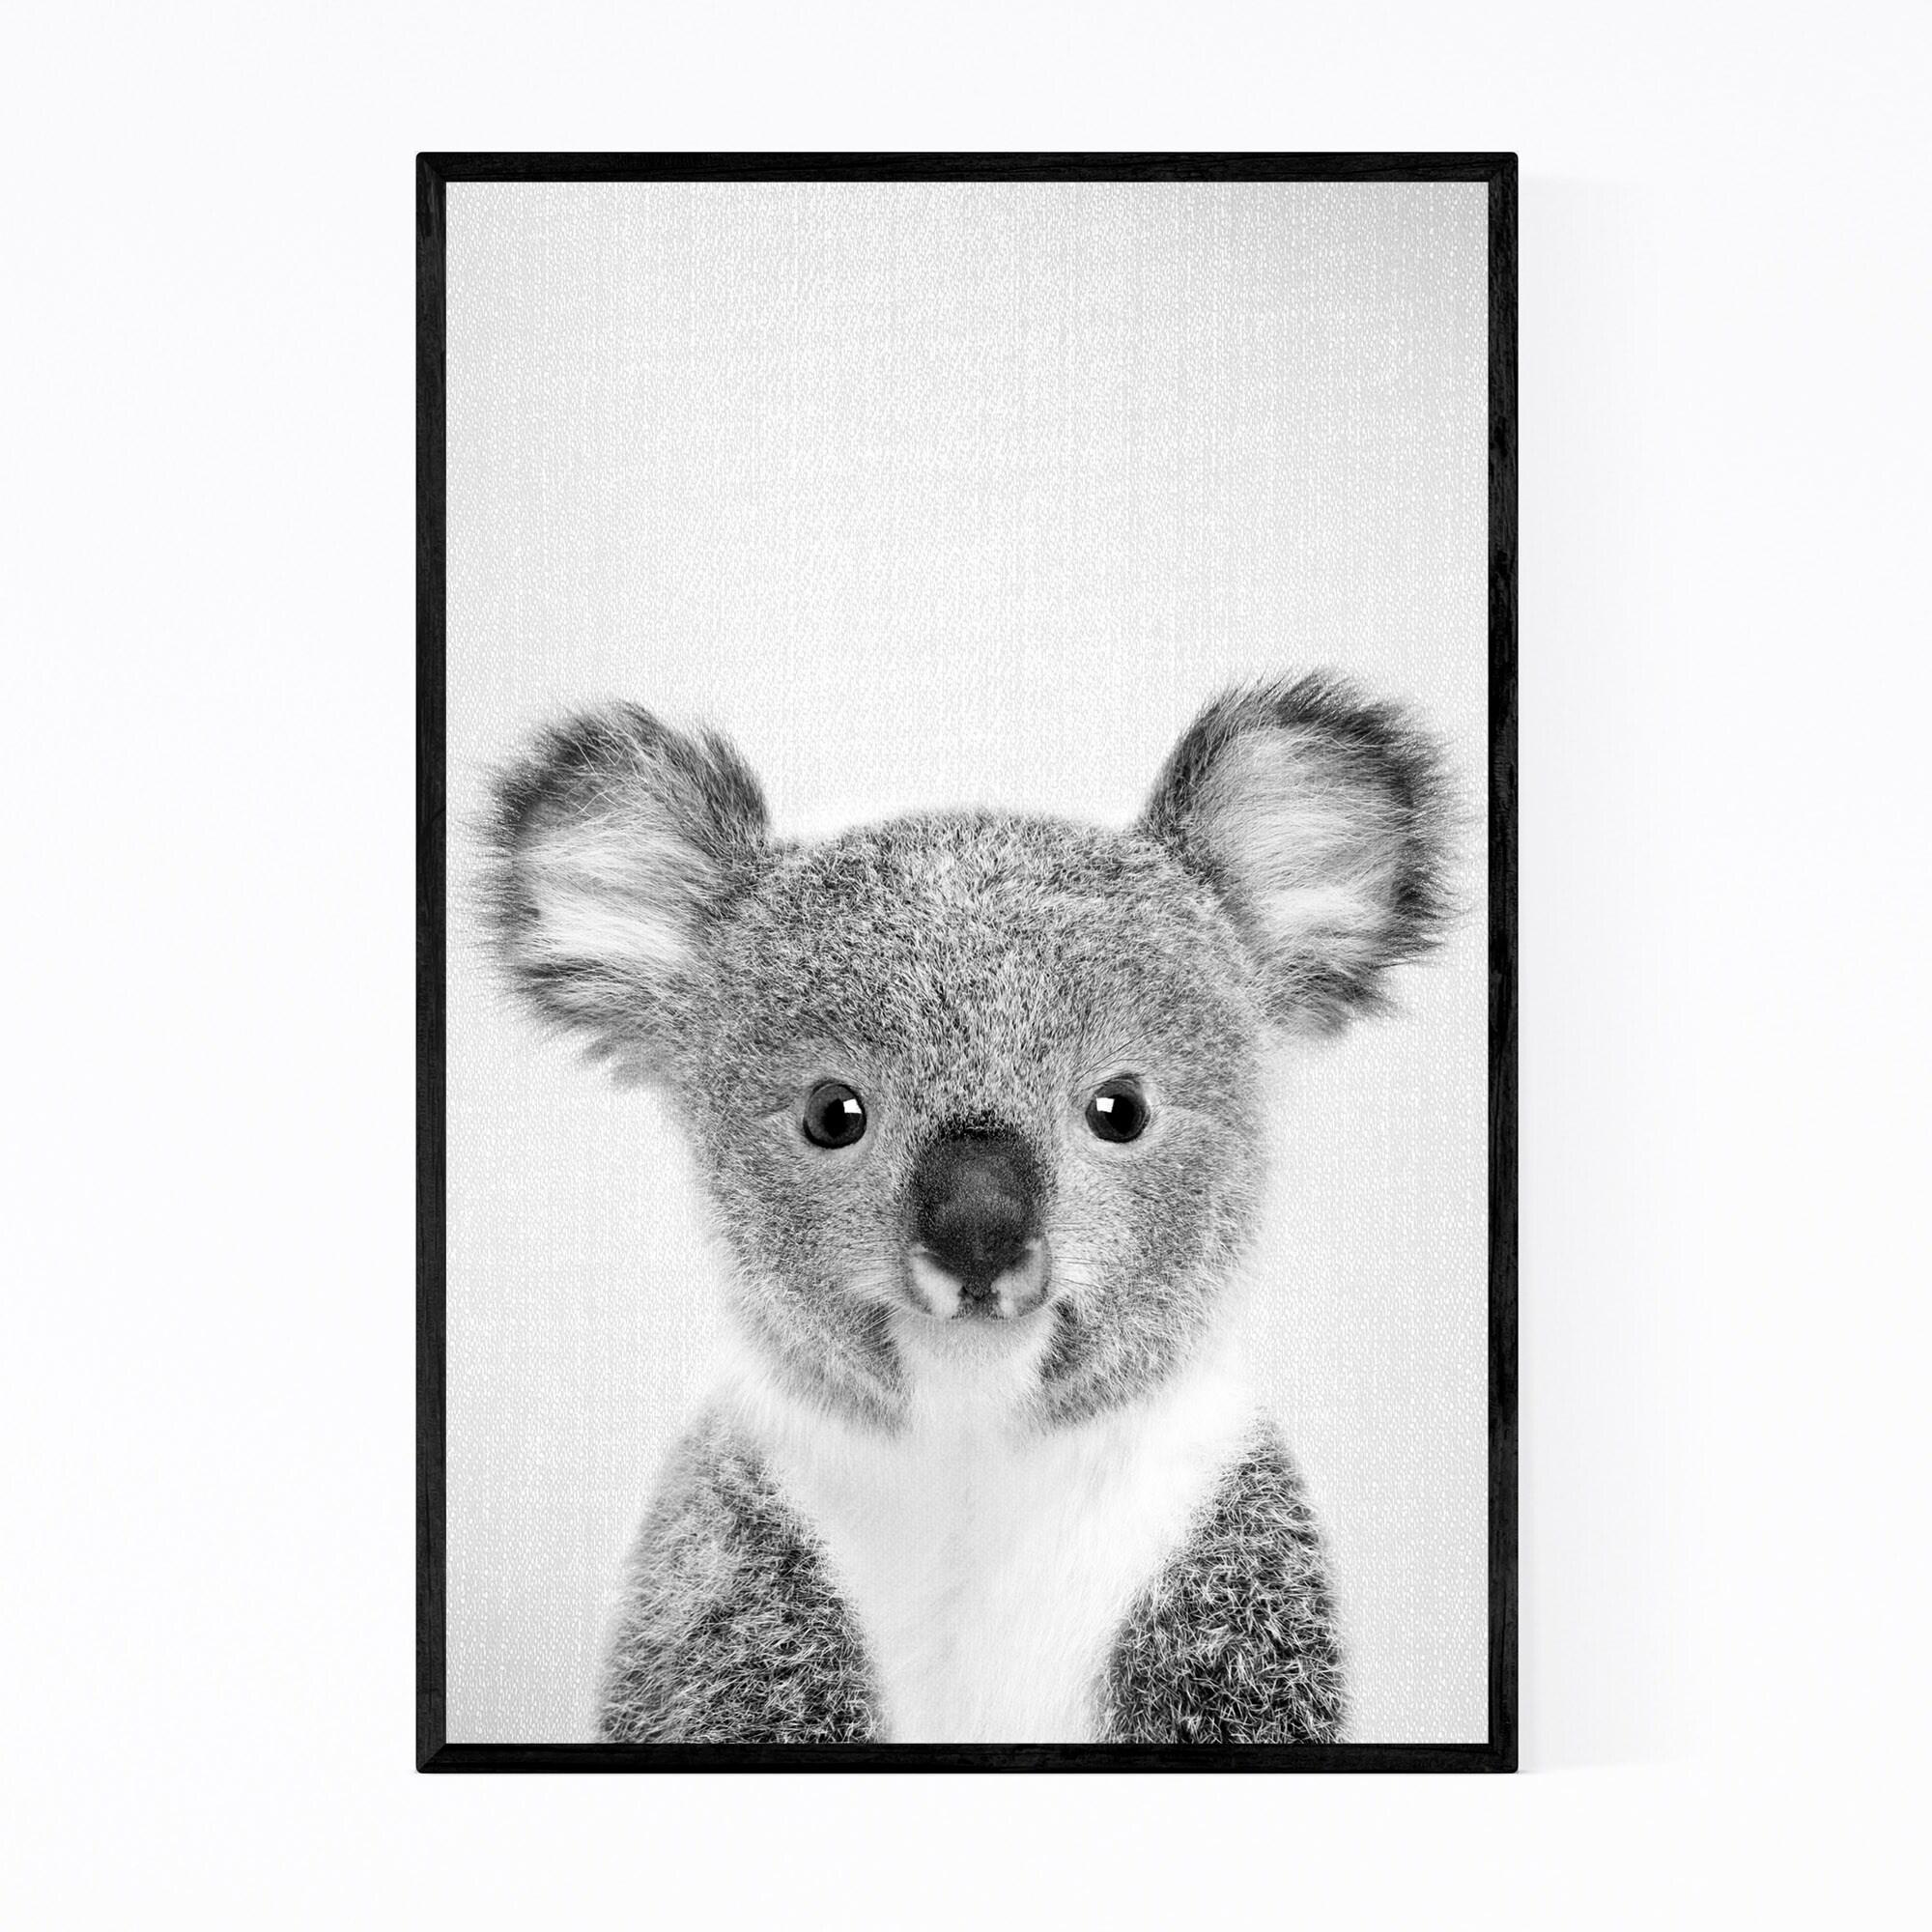 Shop Noir Gallery Cute Baby Koala Peekaboo Animal Framed Art Print